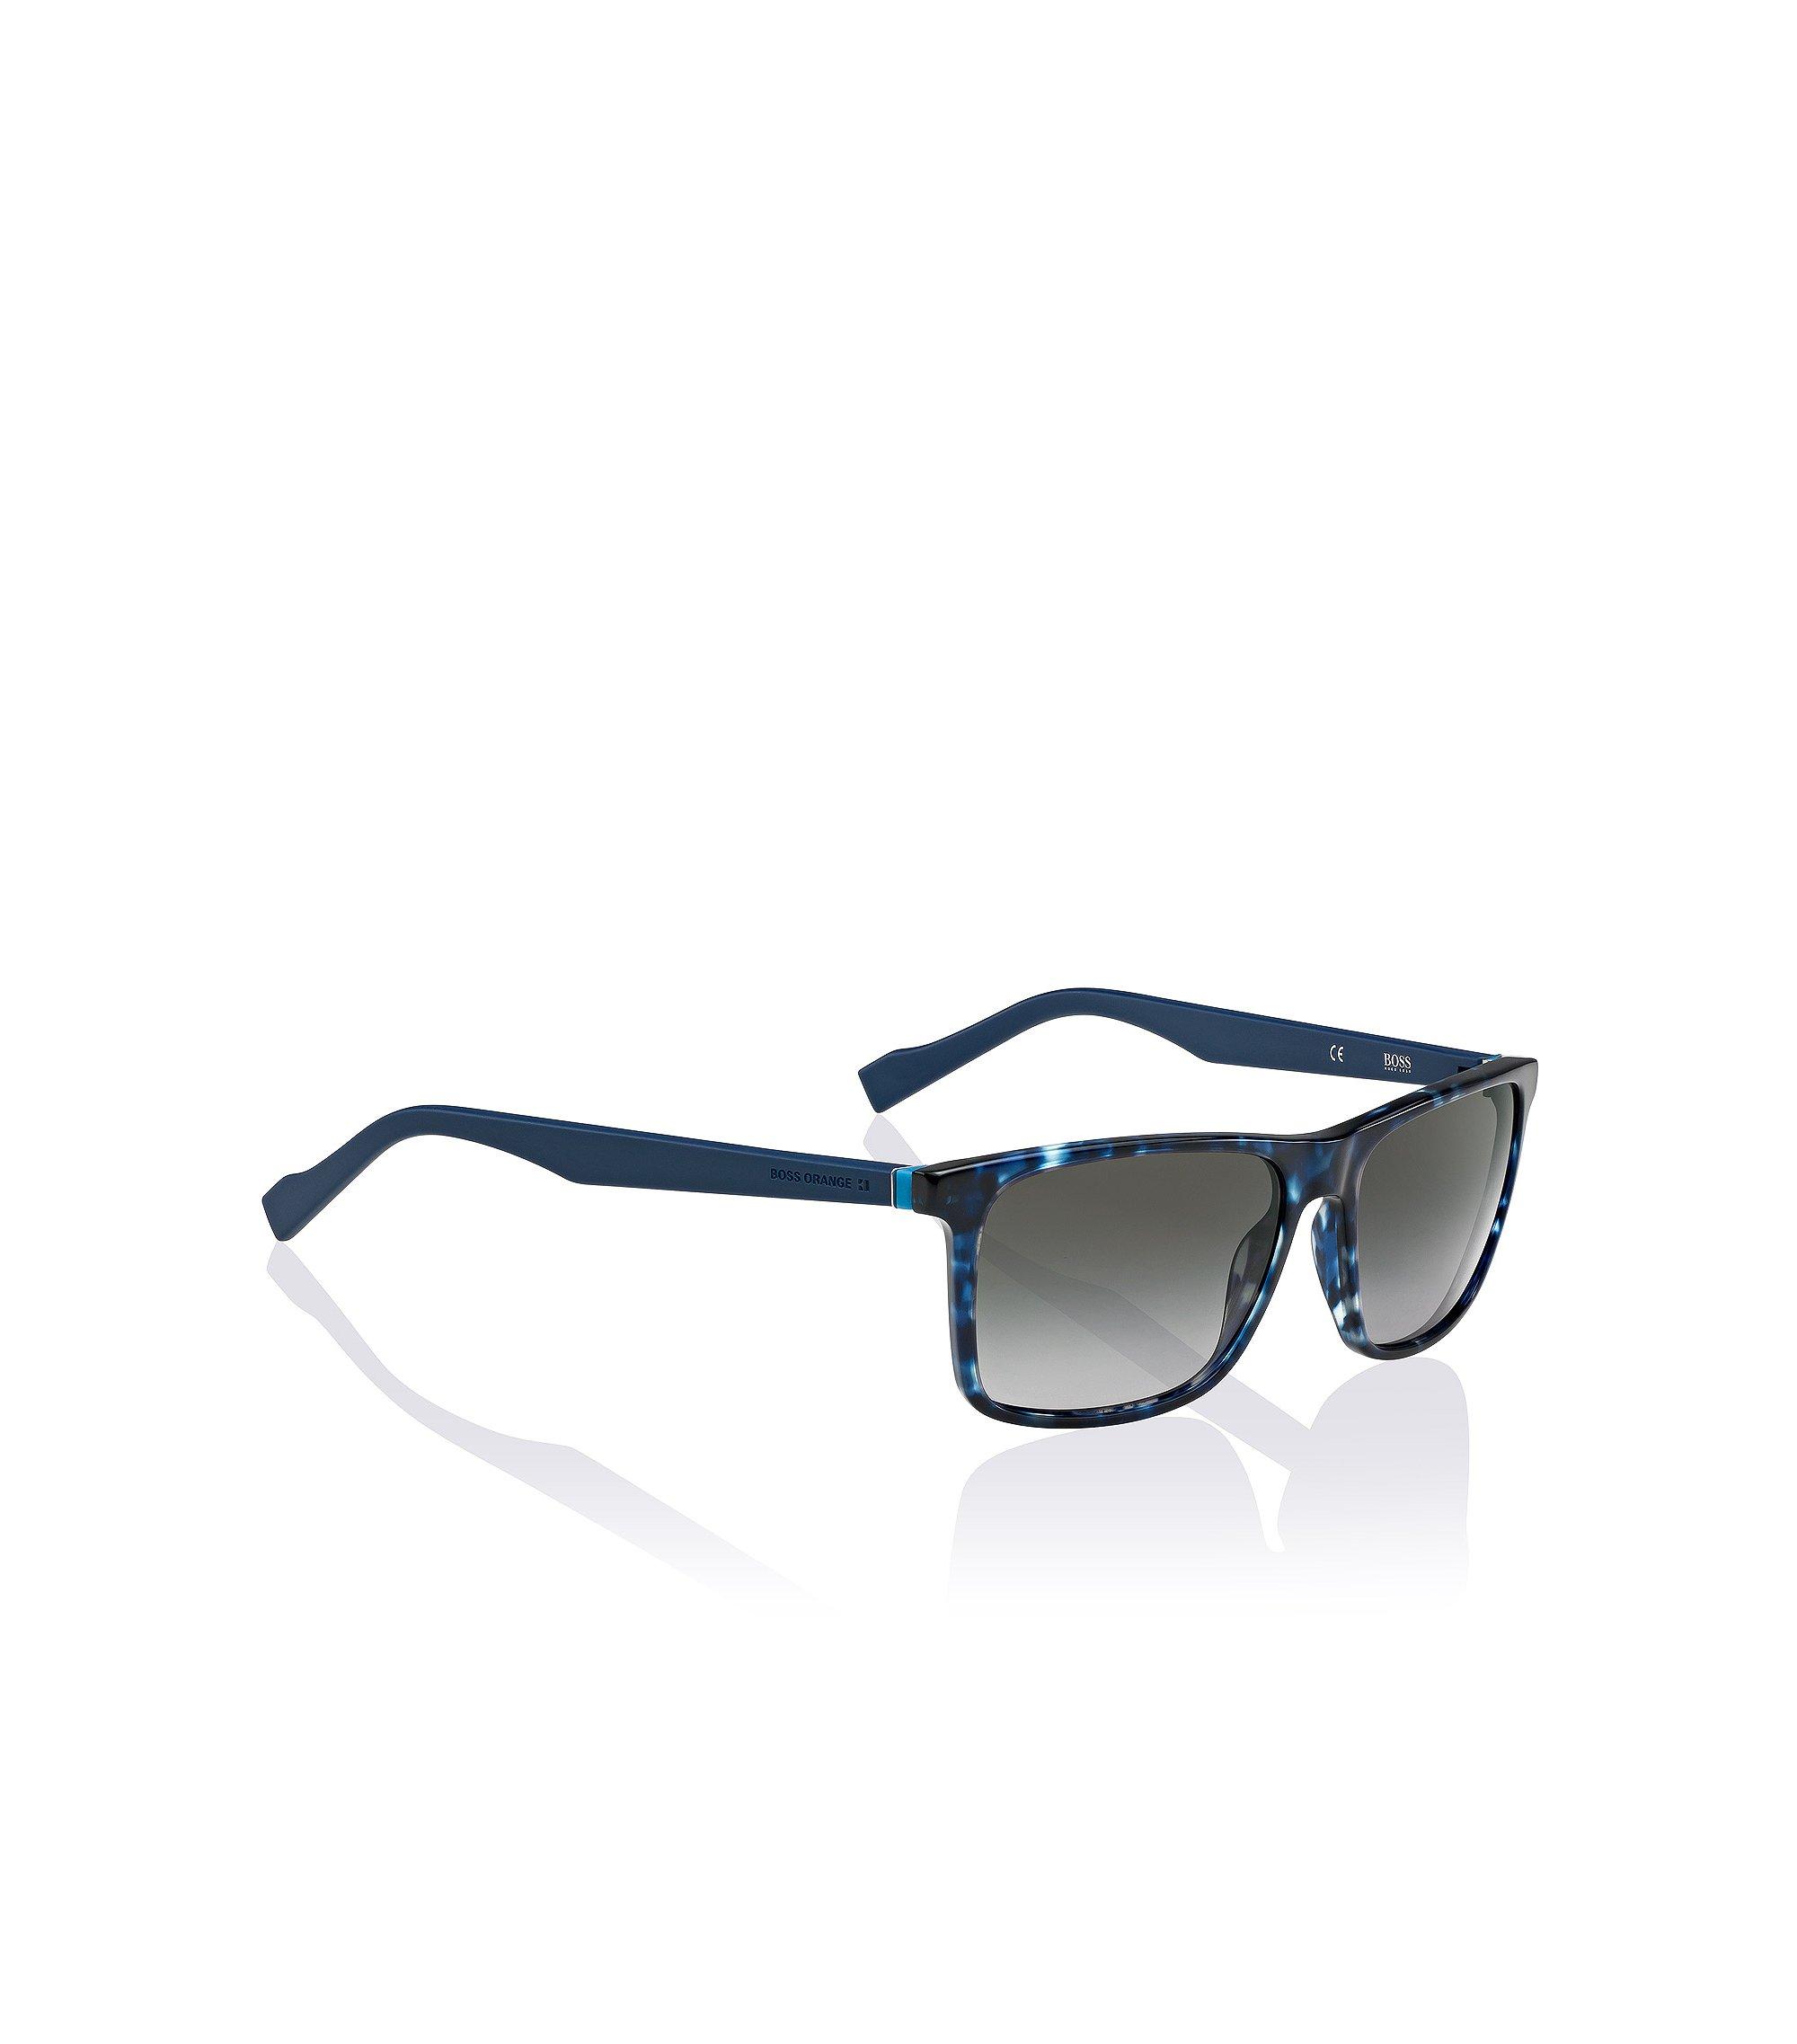 Sonnenbrille ´BO 0174/S`, Assorted-Pre-Pack